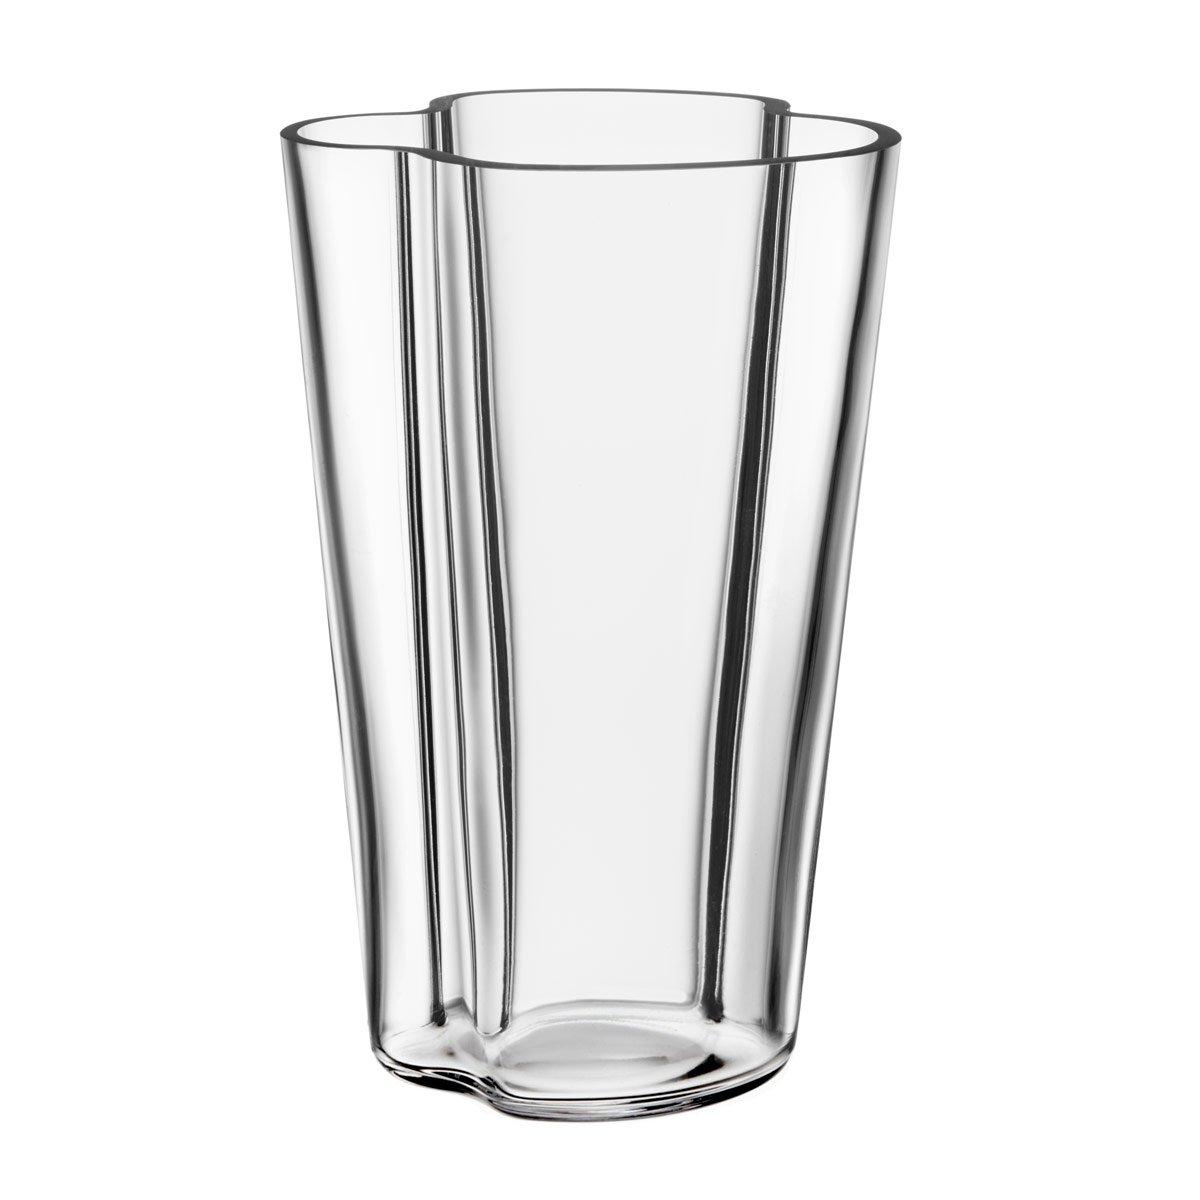 Iittala Alvar Aalto Collection Glass Vase 220 mm Clear 1024738